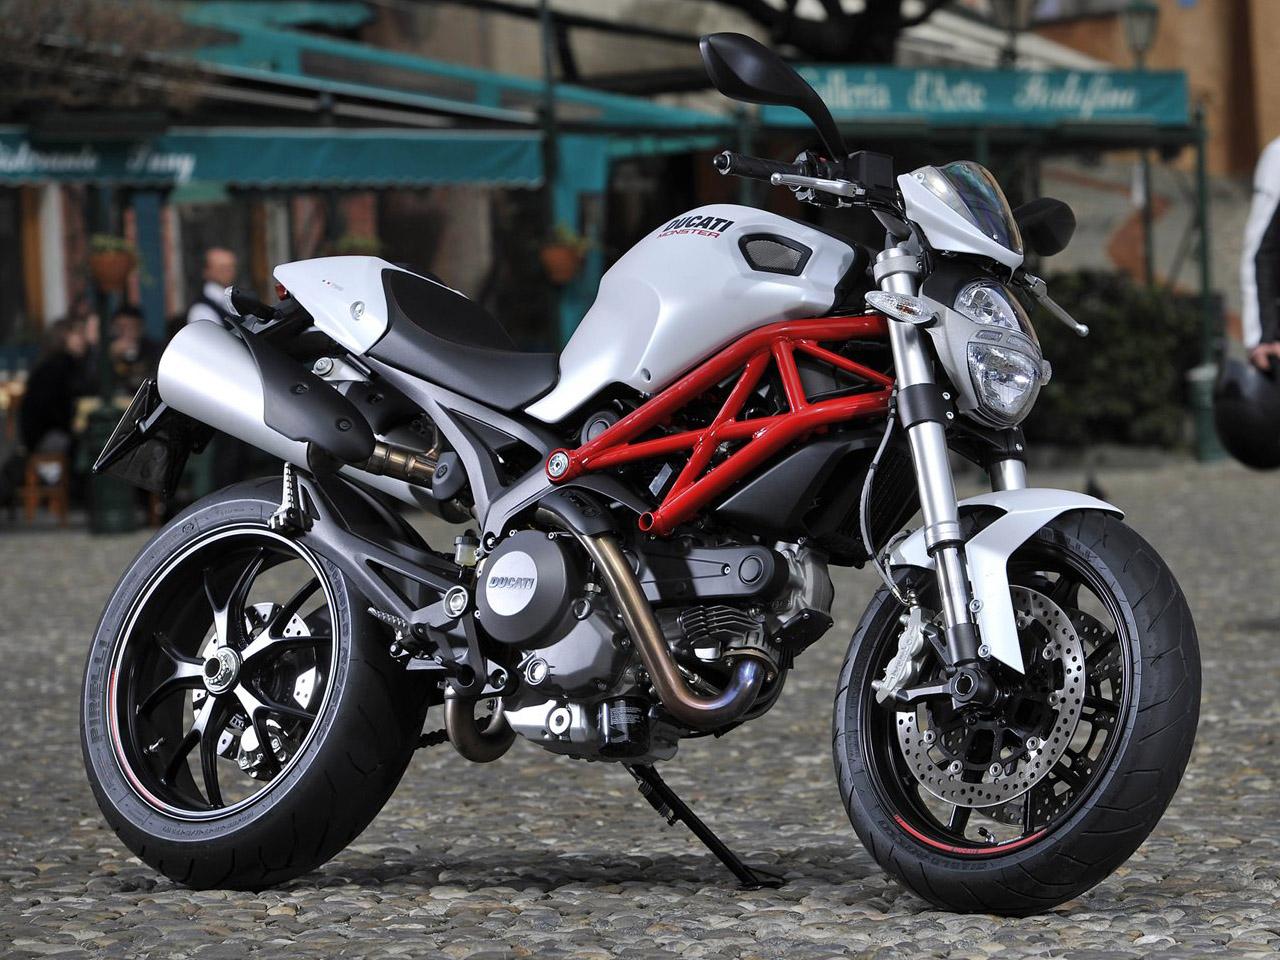 Kawasaki z800 abs tuning car tuning - Ducati Monster 796 2013 Objectif Moto